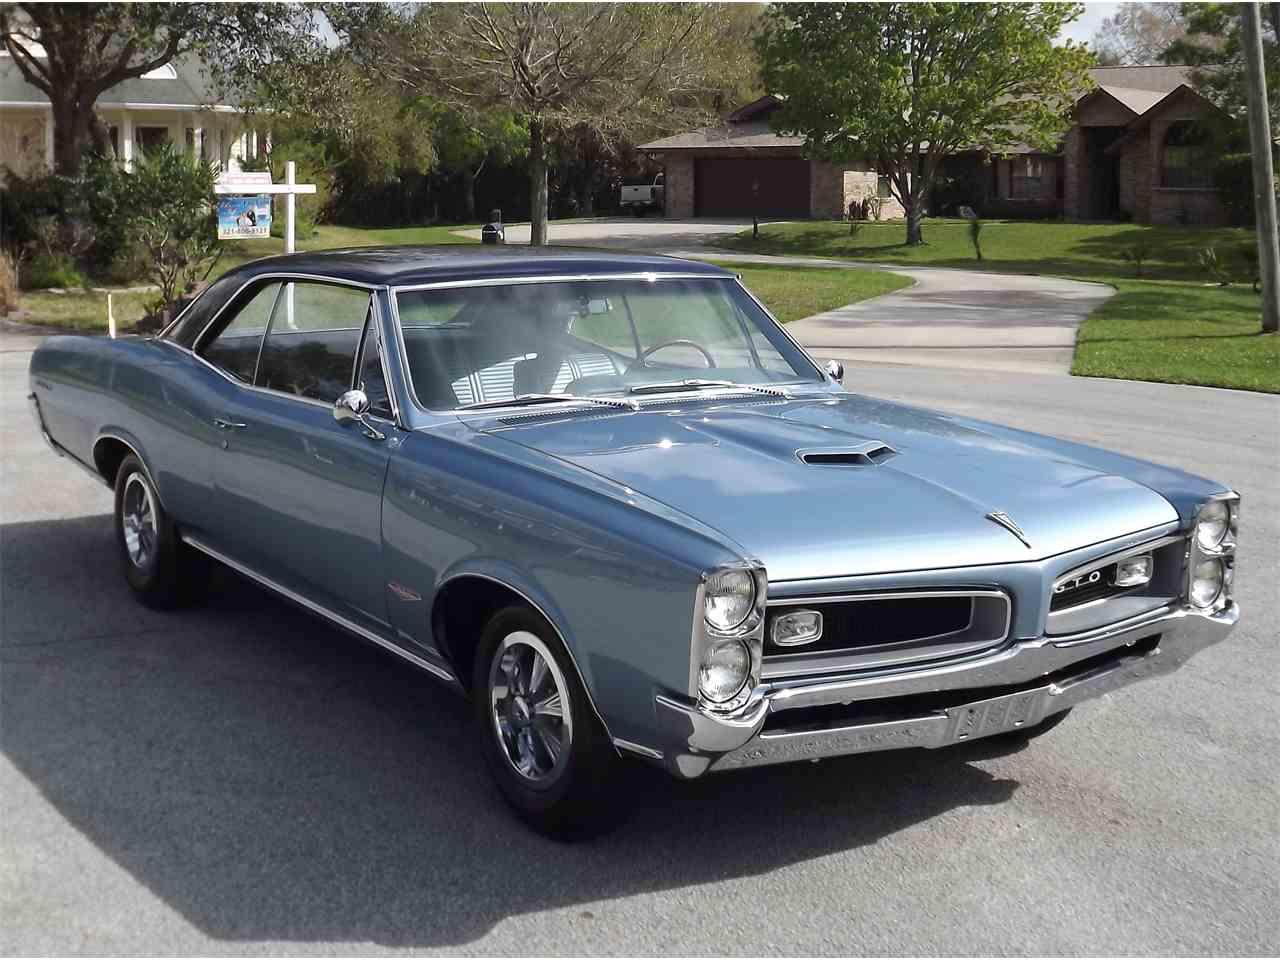 Classic Cars For Sale California Usa: 1966 Pontiac GTO For Sale